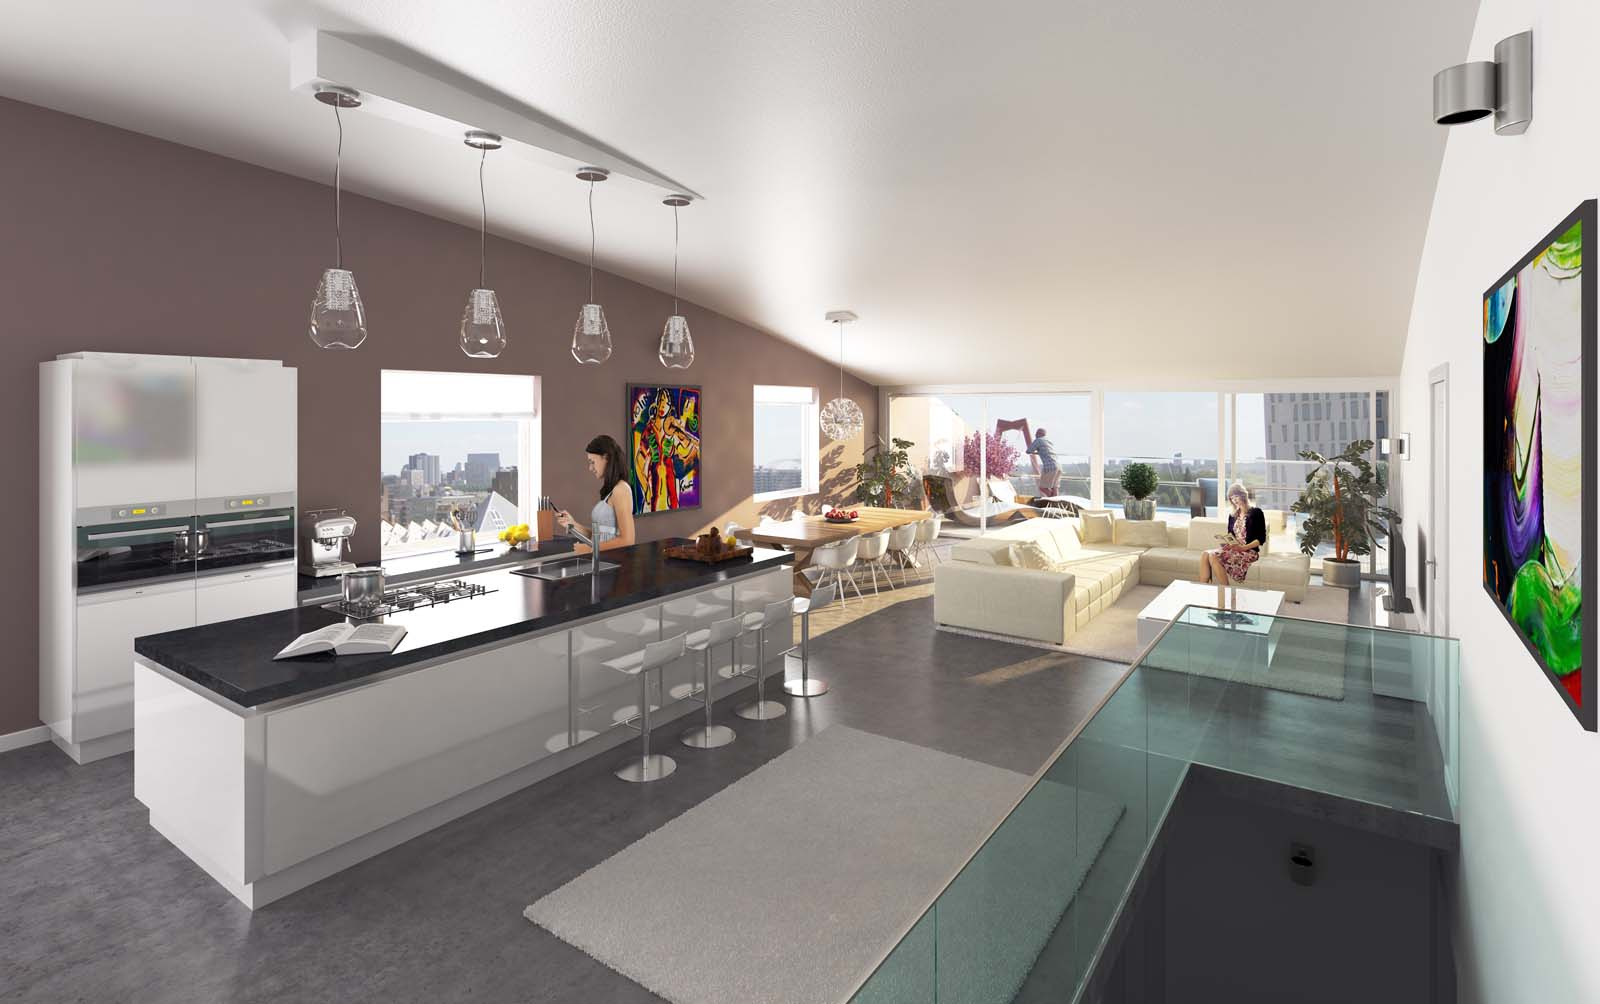 referenzen markthalle rotterdam easydrain. Black Bedroom Furniture Sets. Home Design Ideas